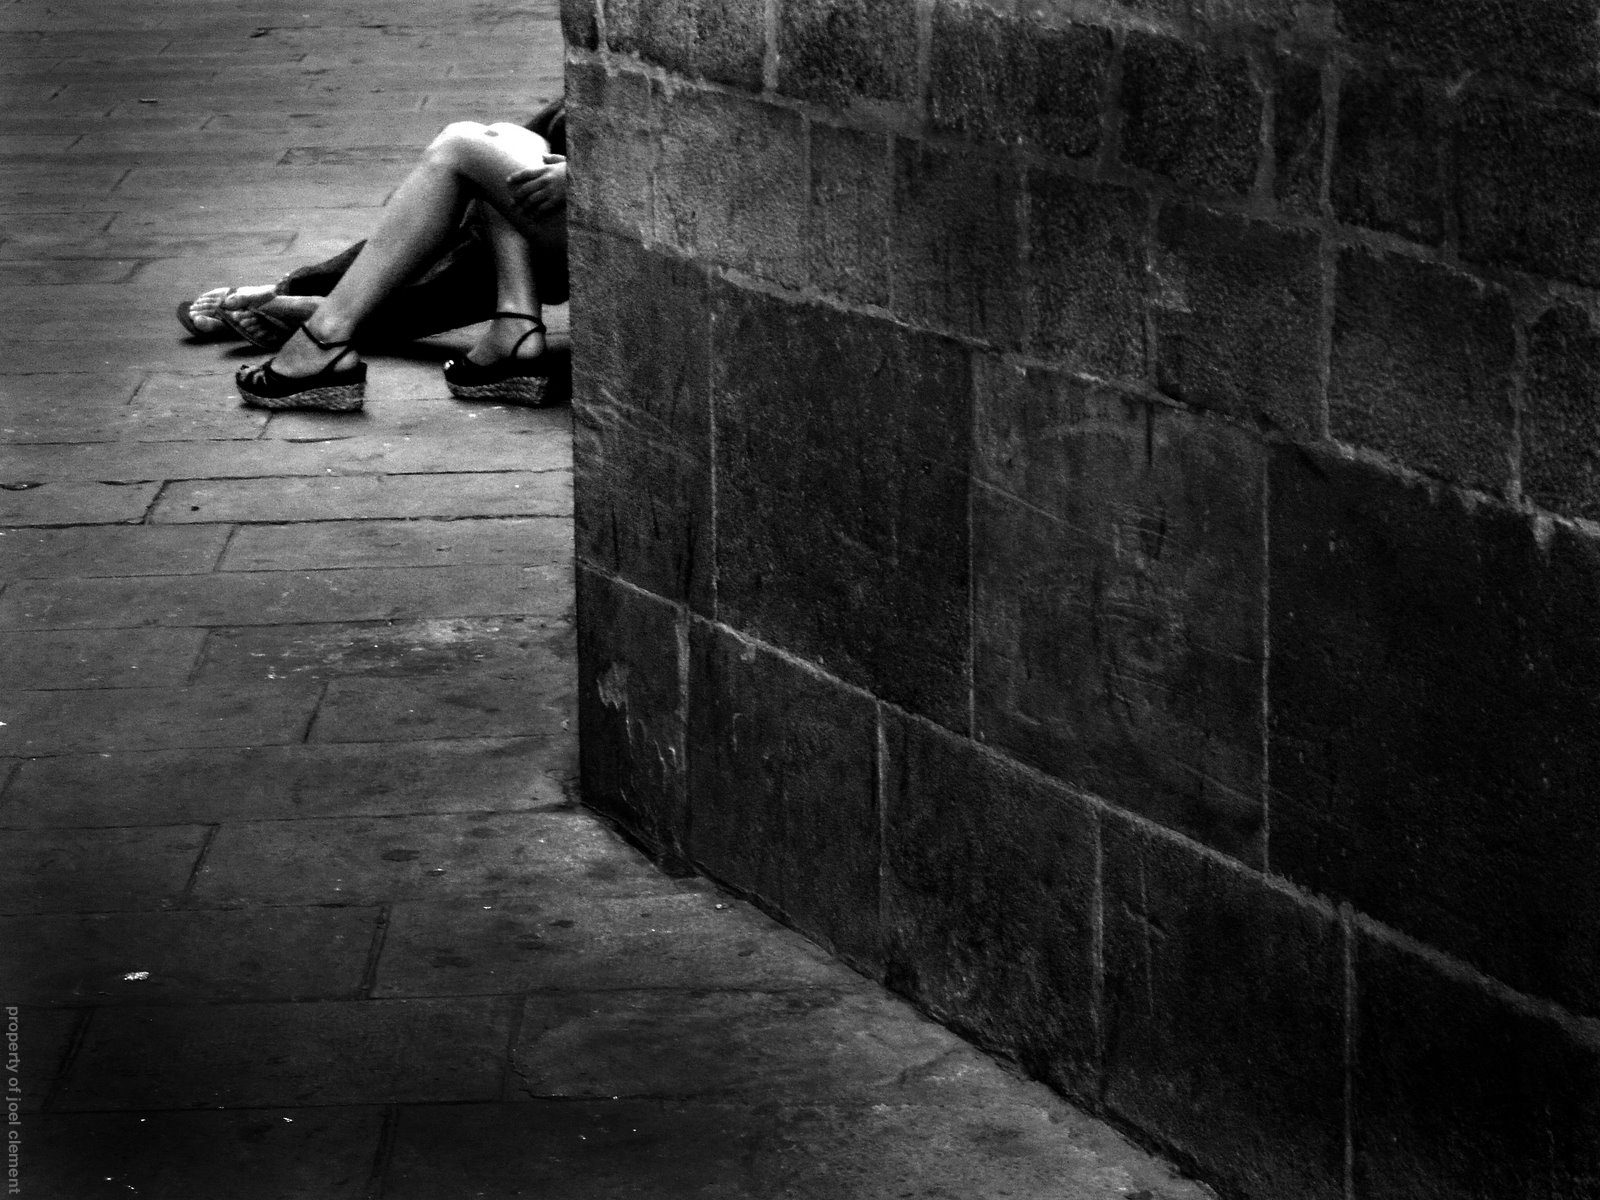 barcelona-joelclement_o.jpg